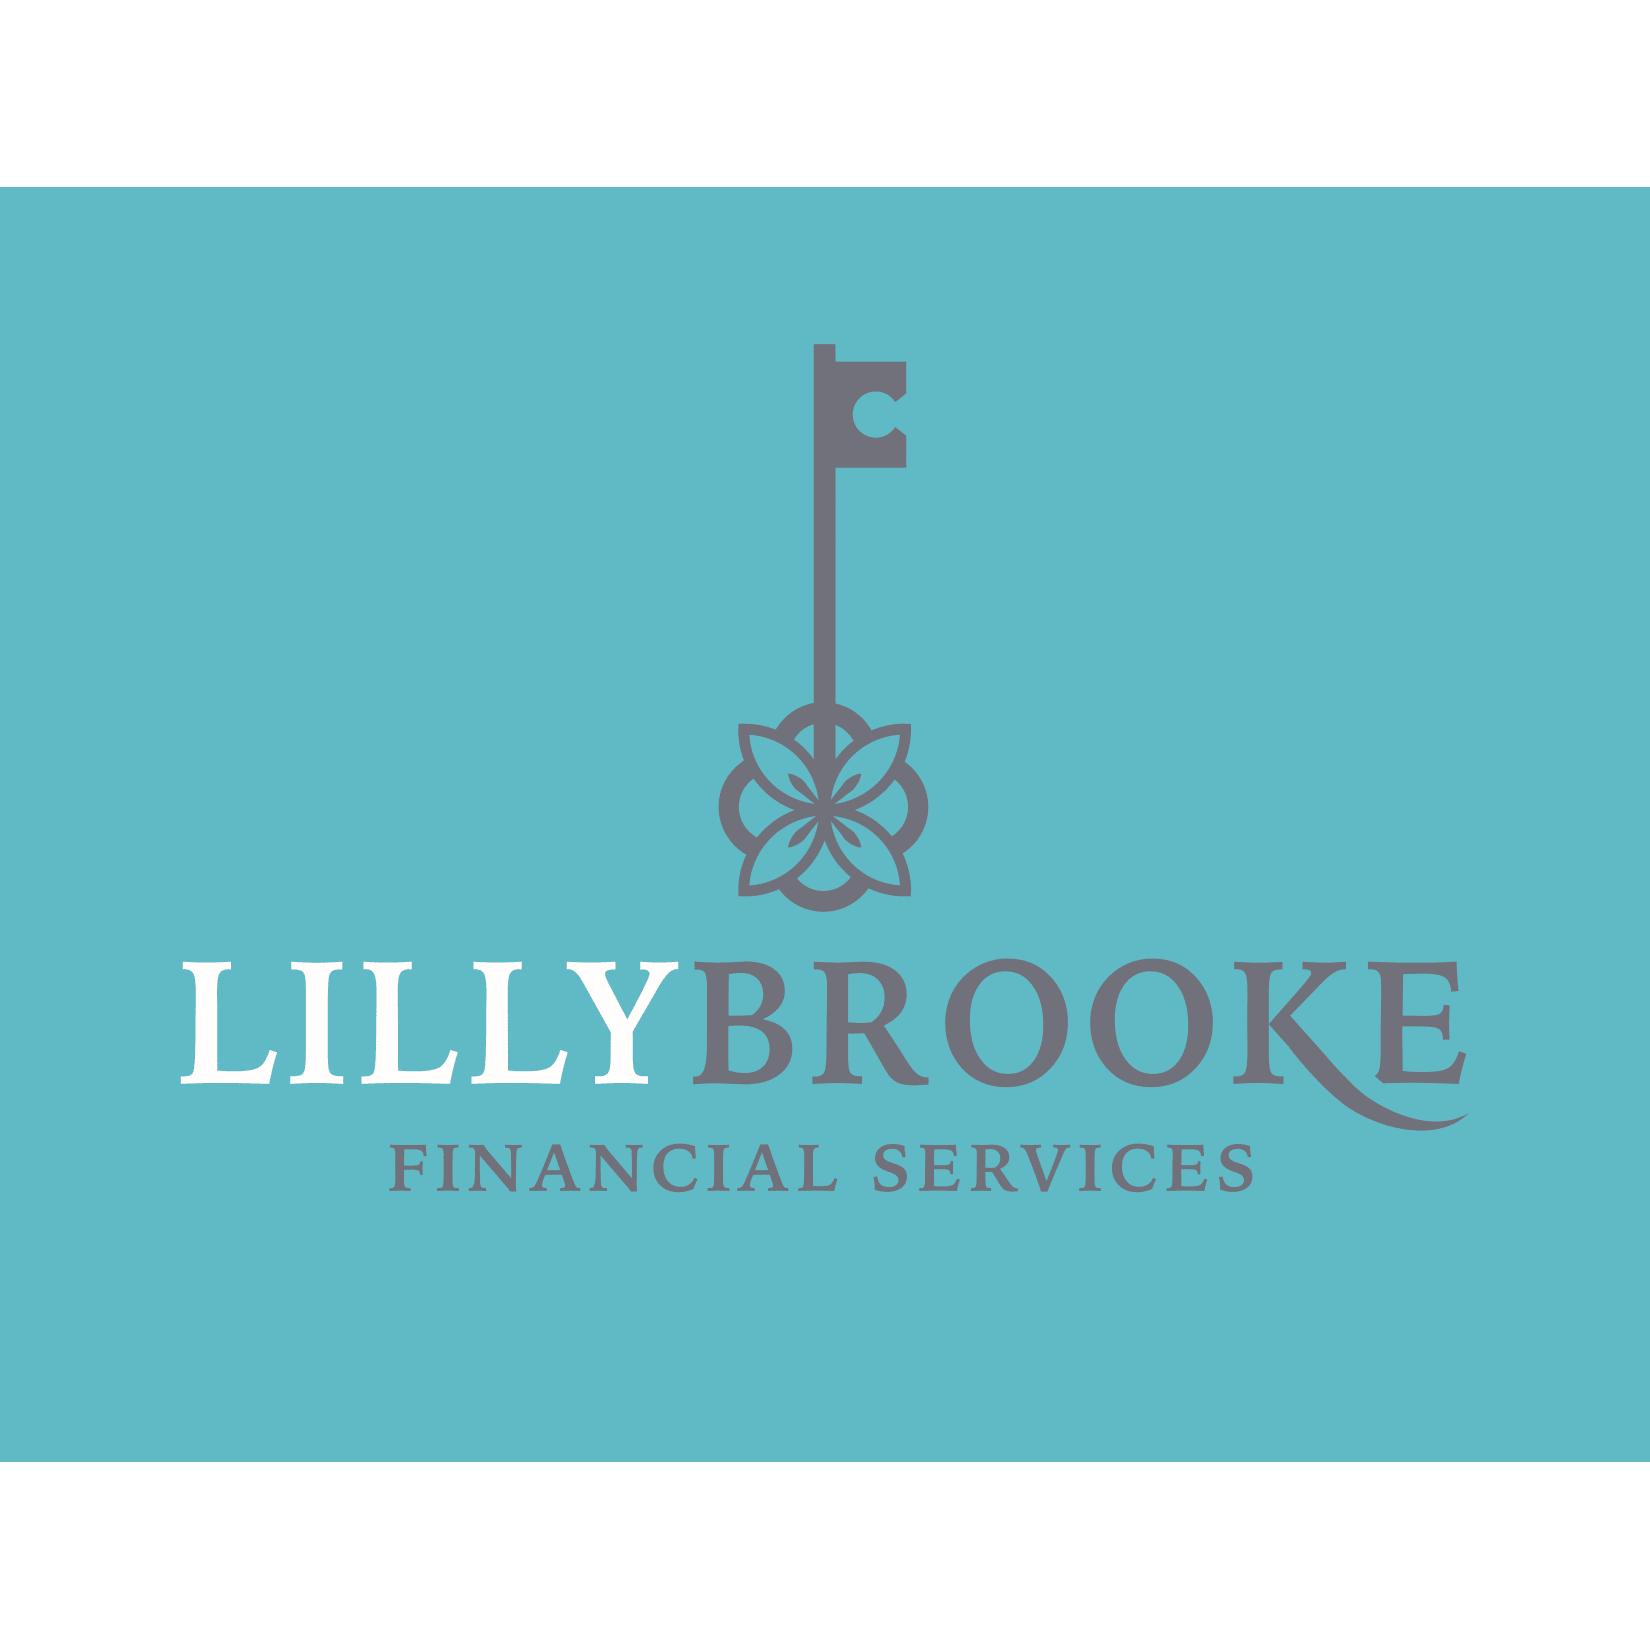 LillyBrooke Financial Services | Flat 1, 42, Kingsley Rd, Northampton NN2 7BL | +44 1604 926212